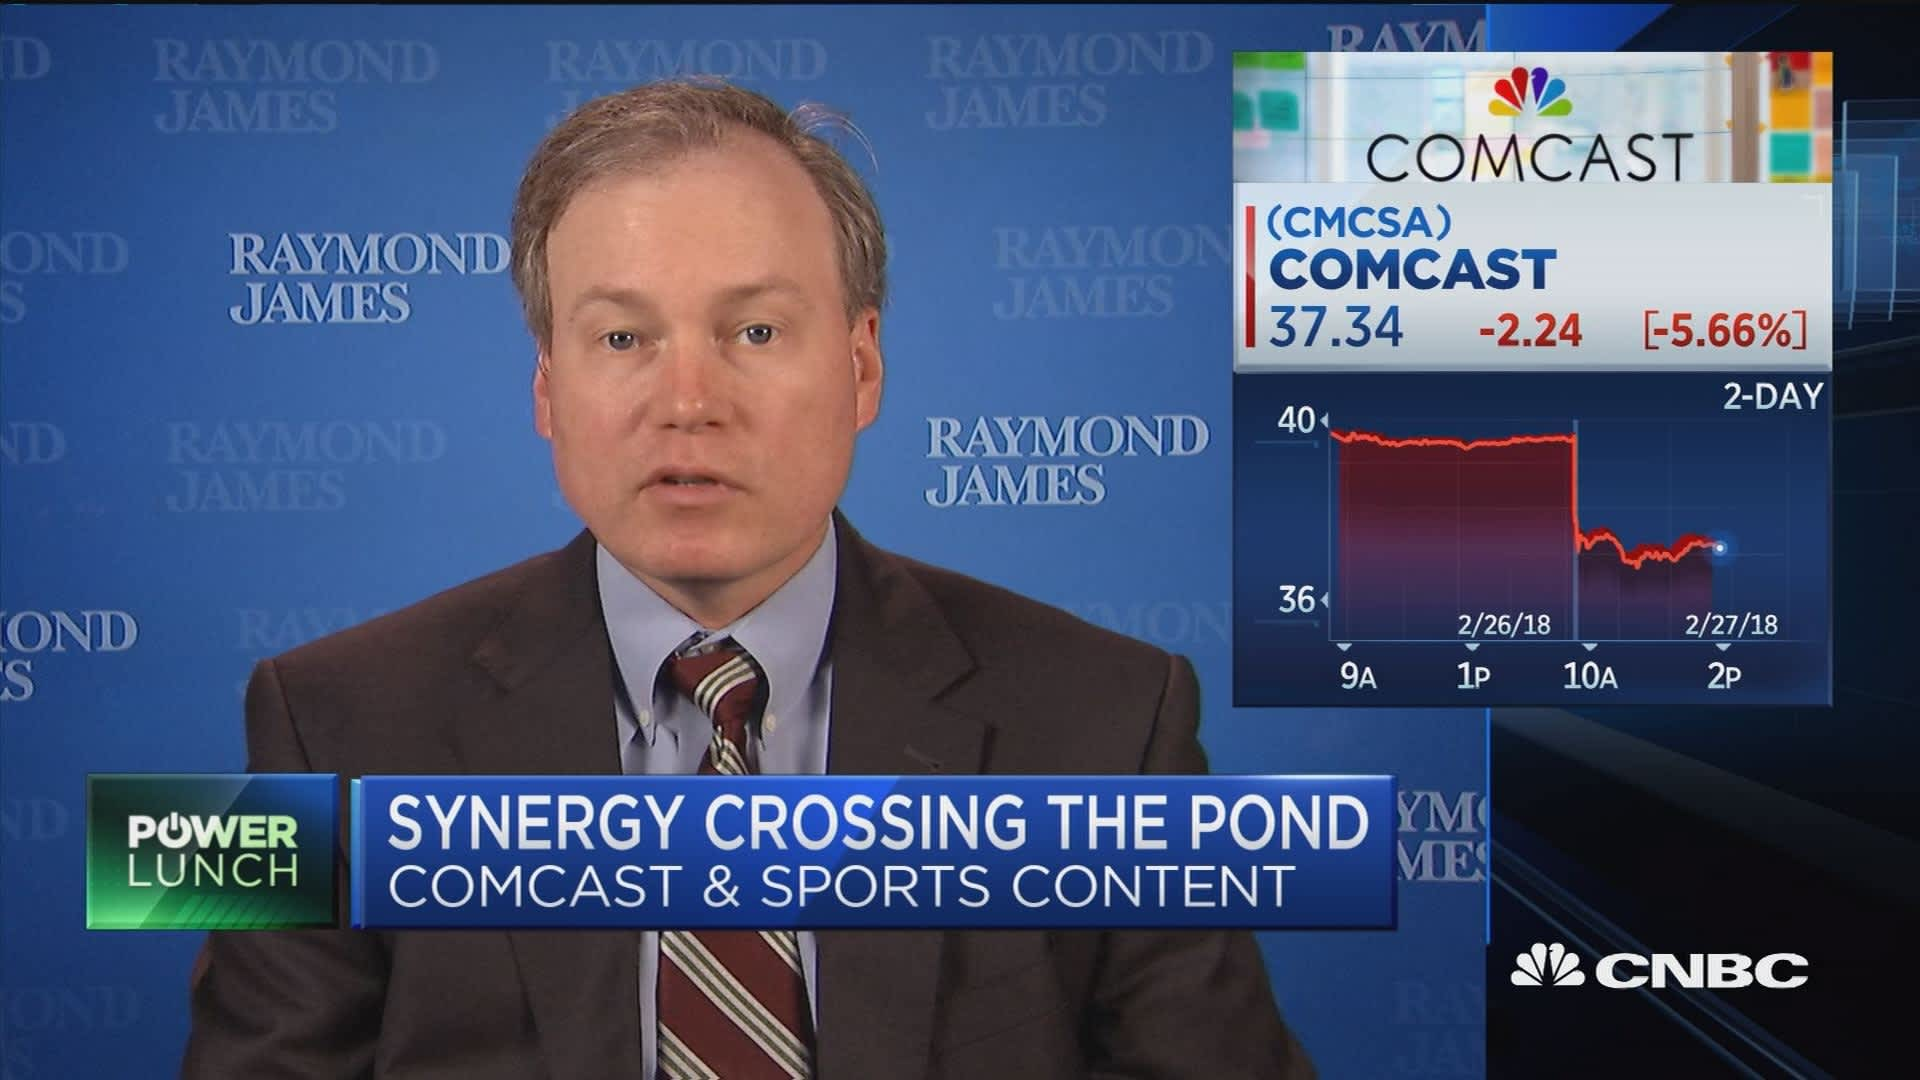 raymond james cryptocurrency